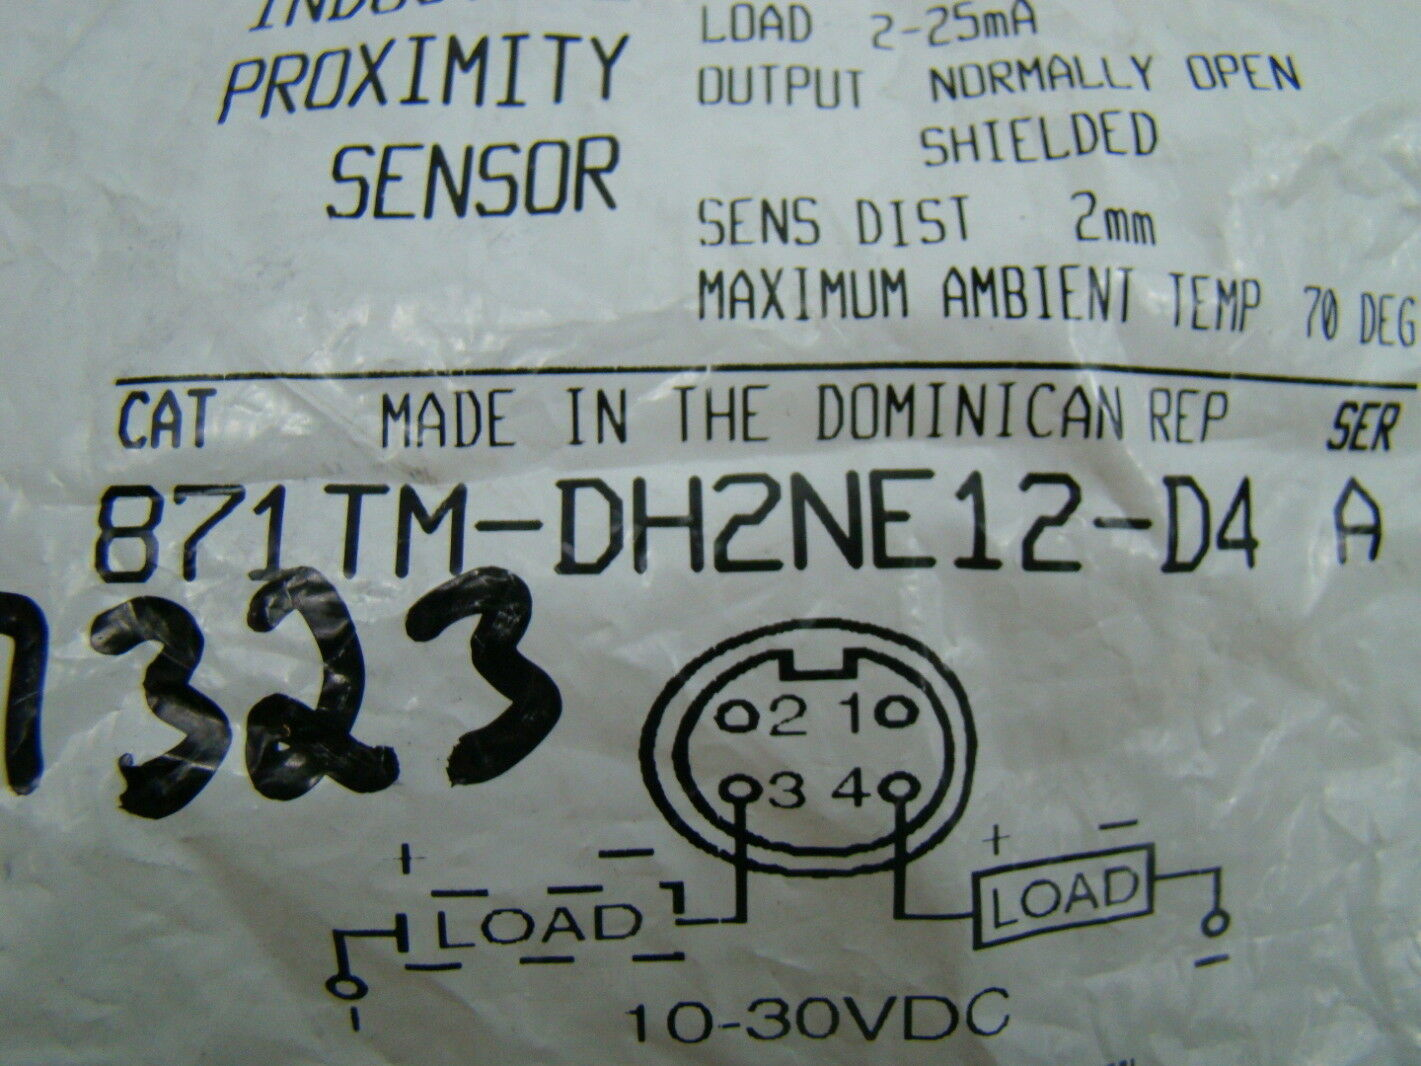 Allen Bradley Inductive Proximity Sensor 10 30vdc 871tm Dh2ne12 D4 Sensors